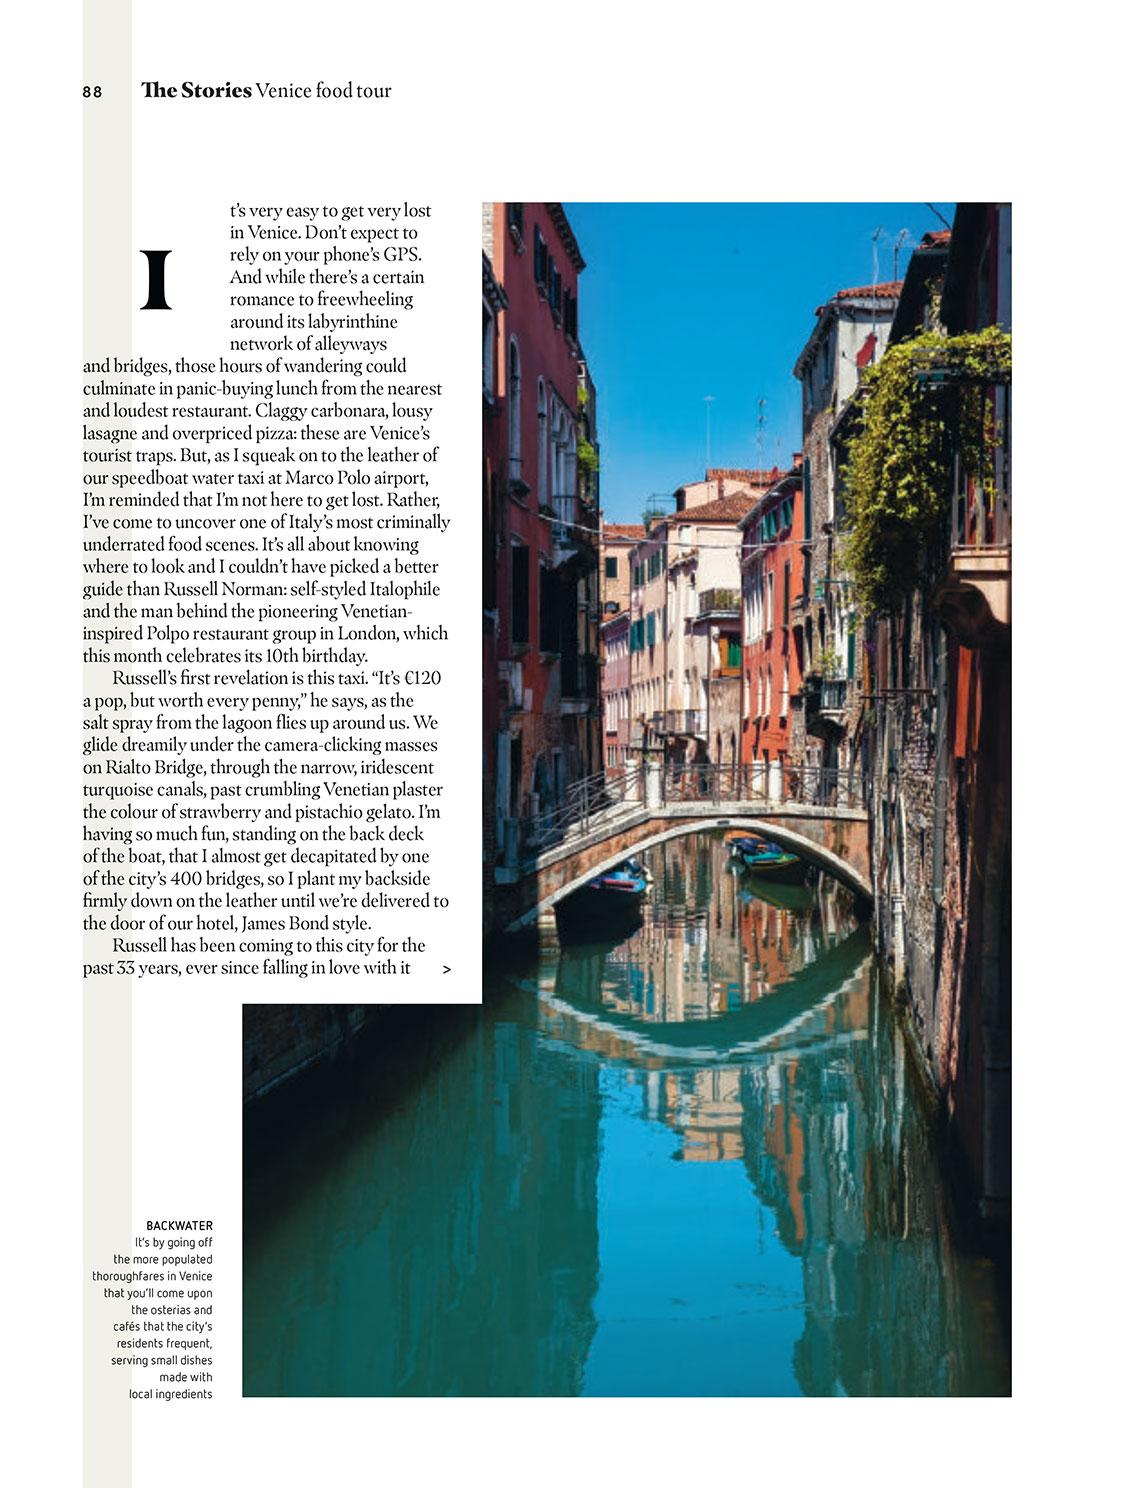 Venice-Russell-Norman-02.jpg